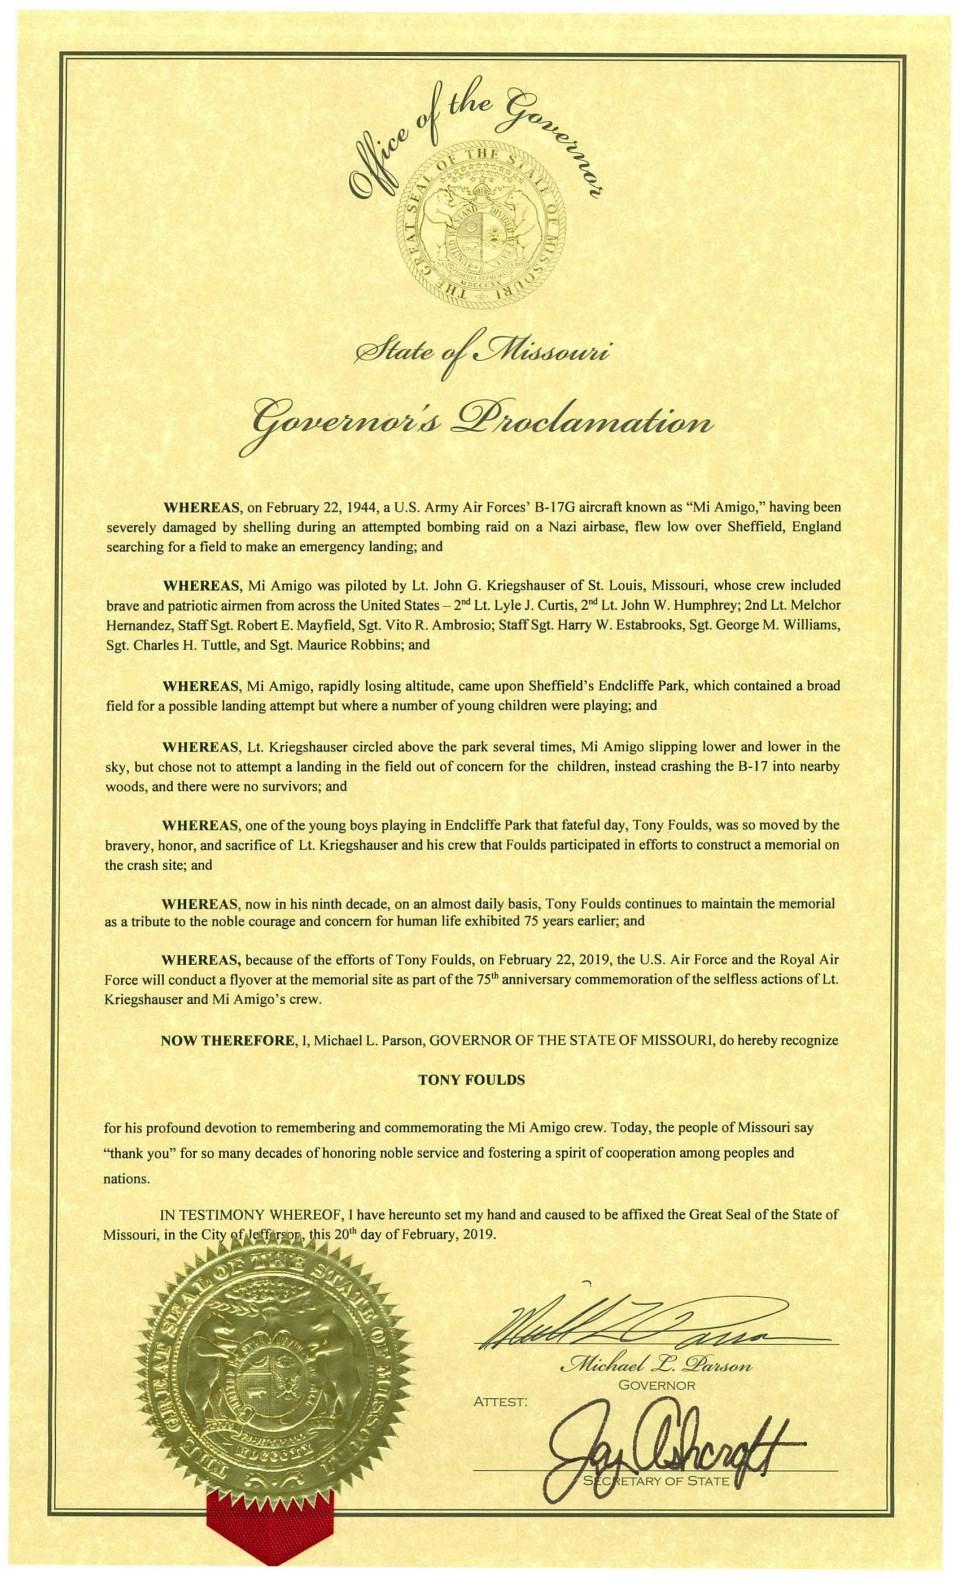 Tony Foulds Proclamation